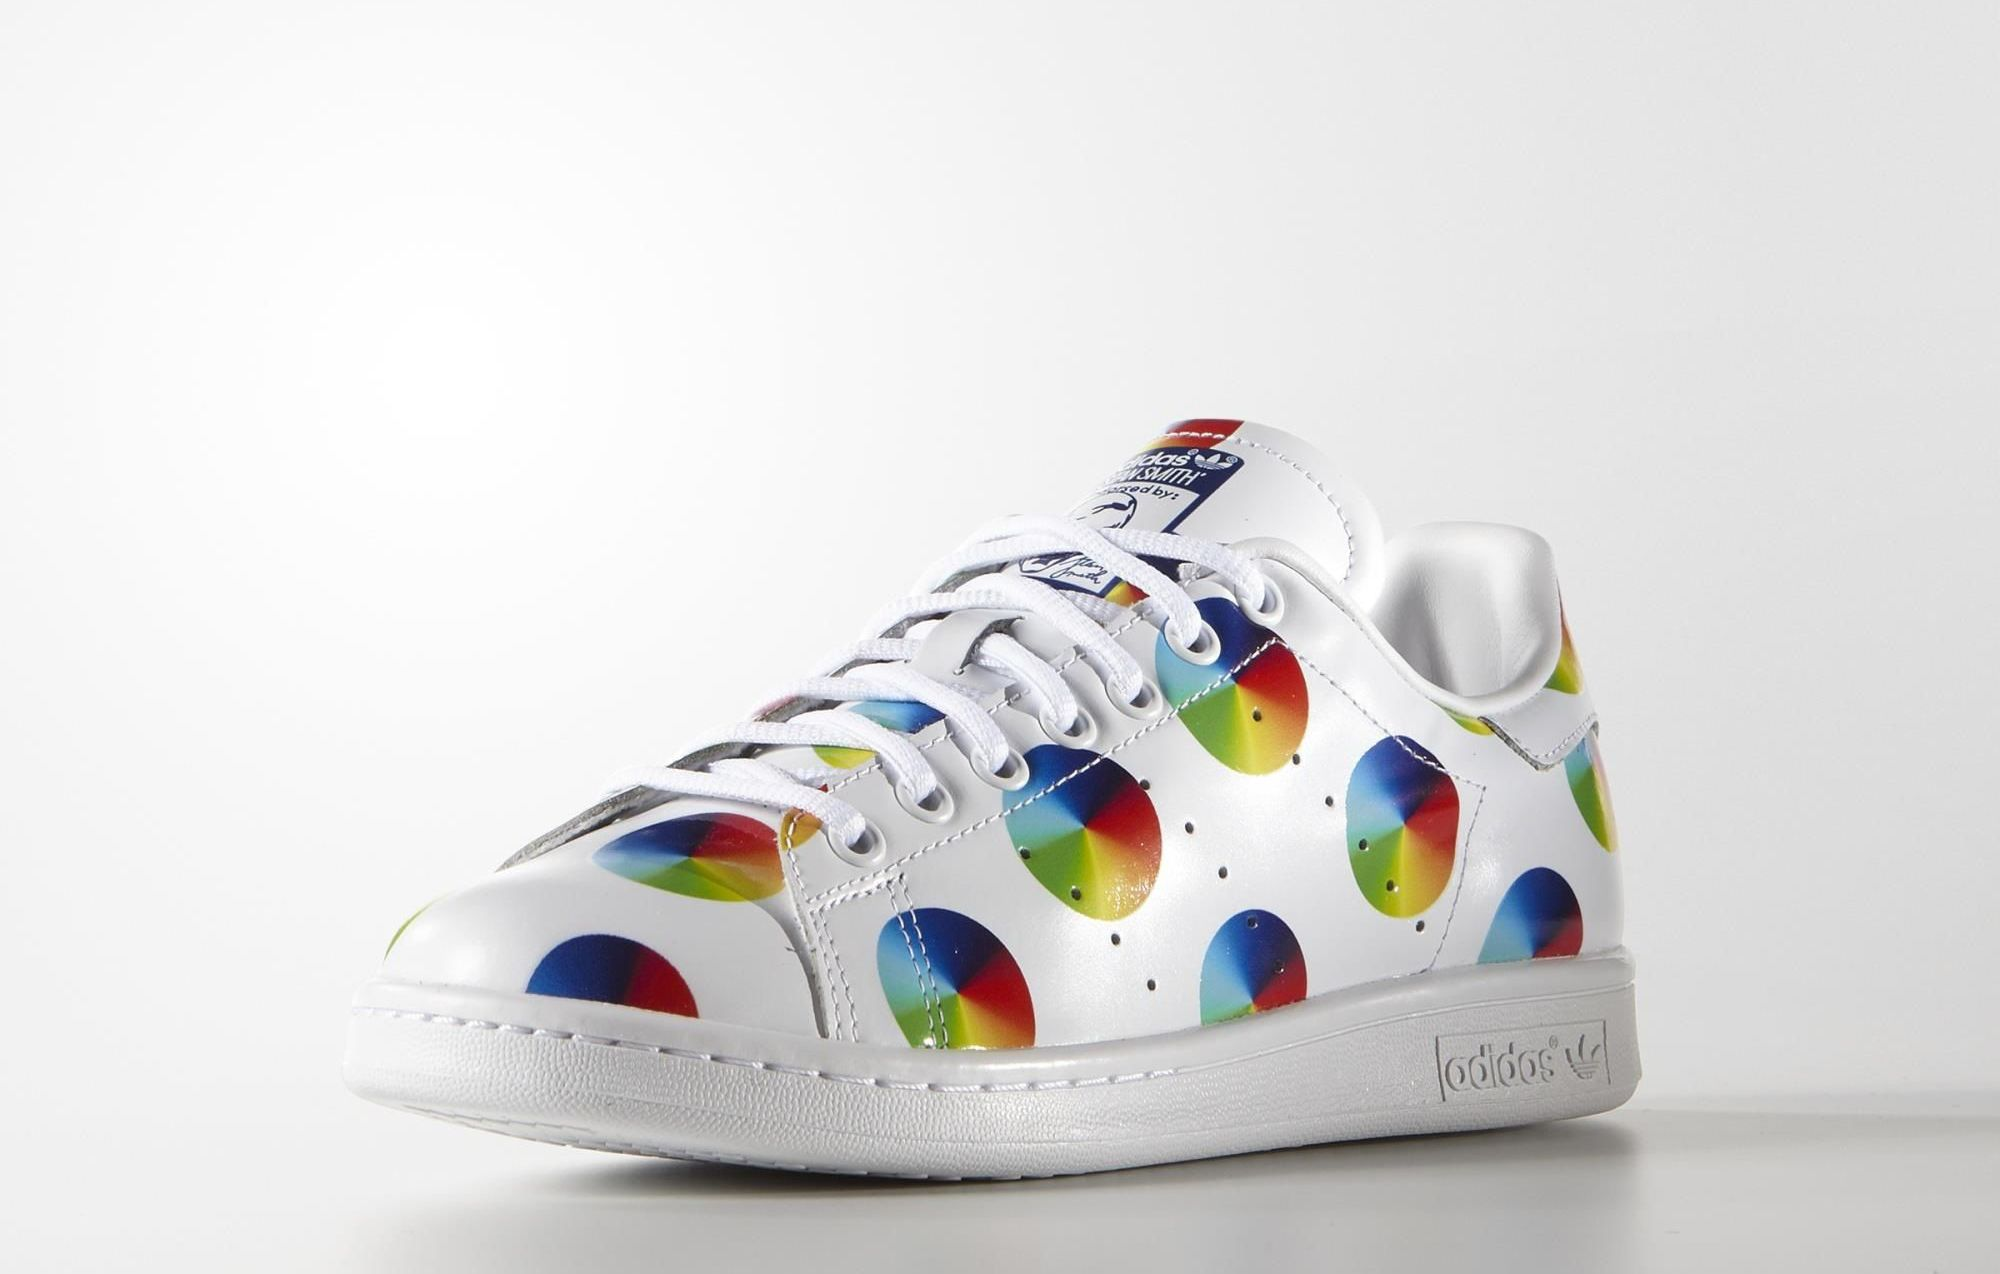 online retailer 019a7 a3755 ... wholesale sneakers femme adidas superstar rose gold adidas shoes for  woman d4d26 e12b4